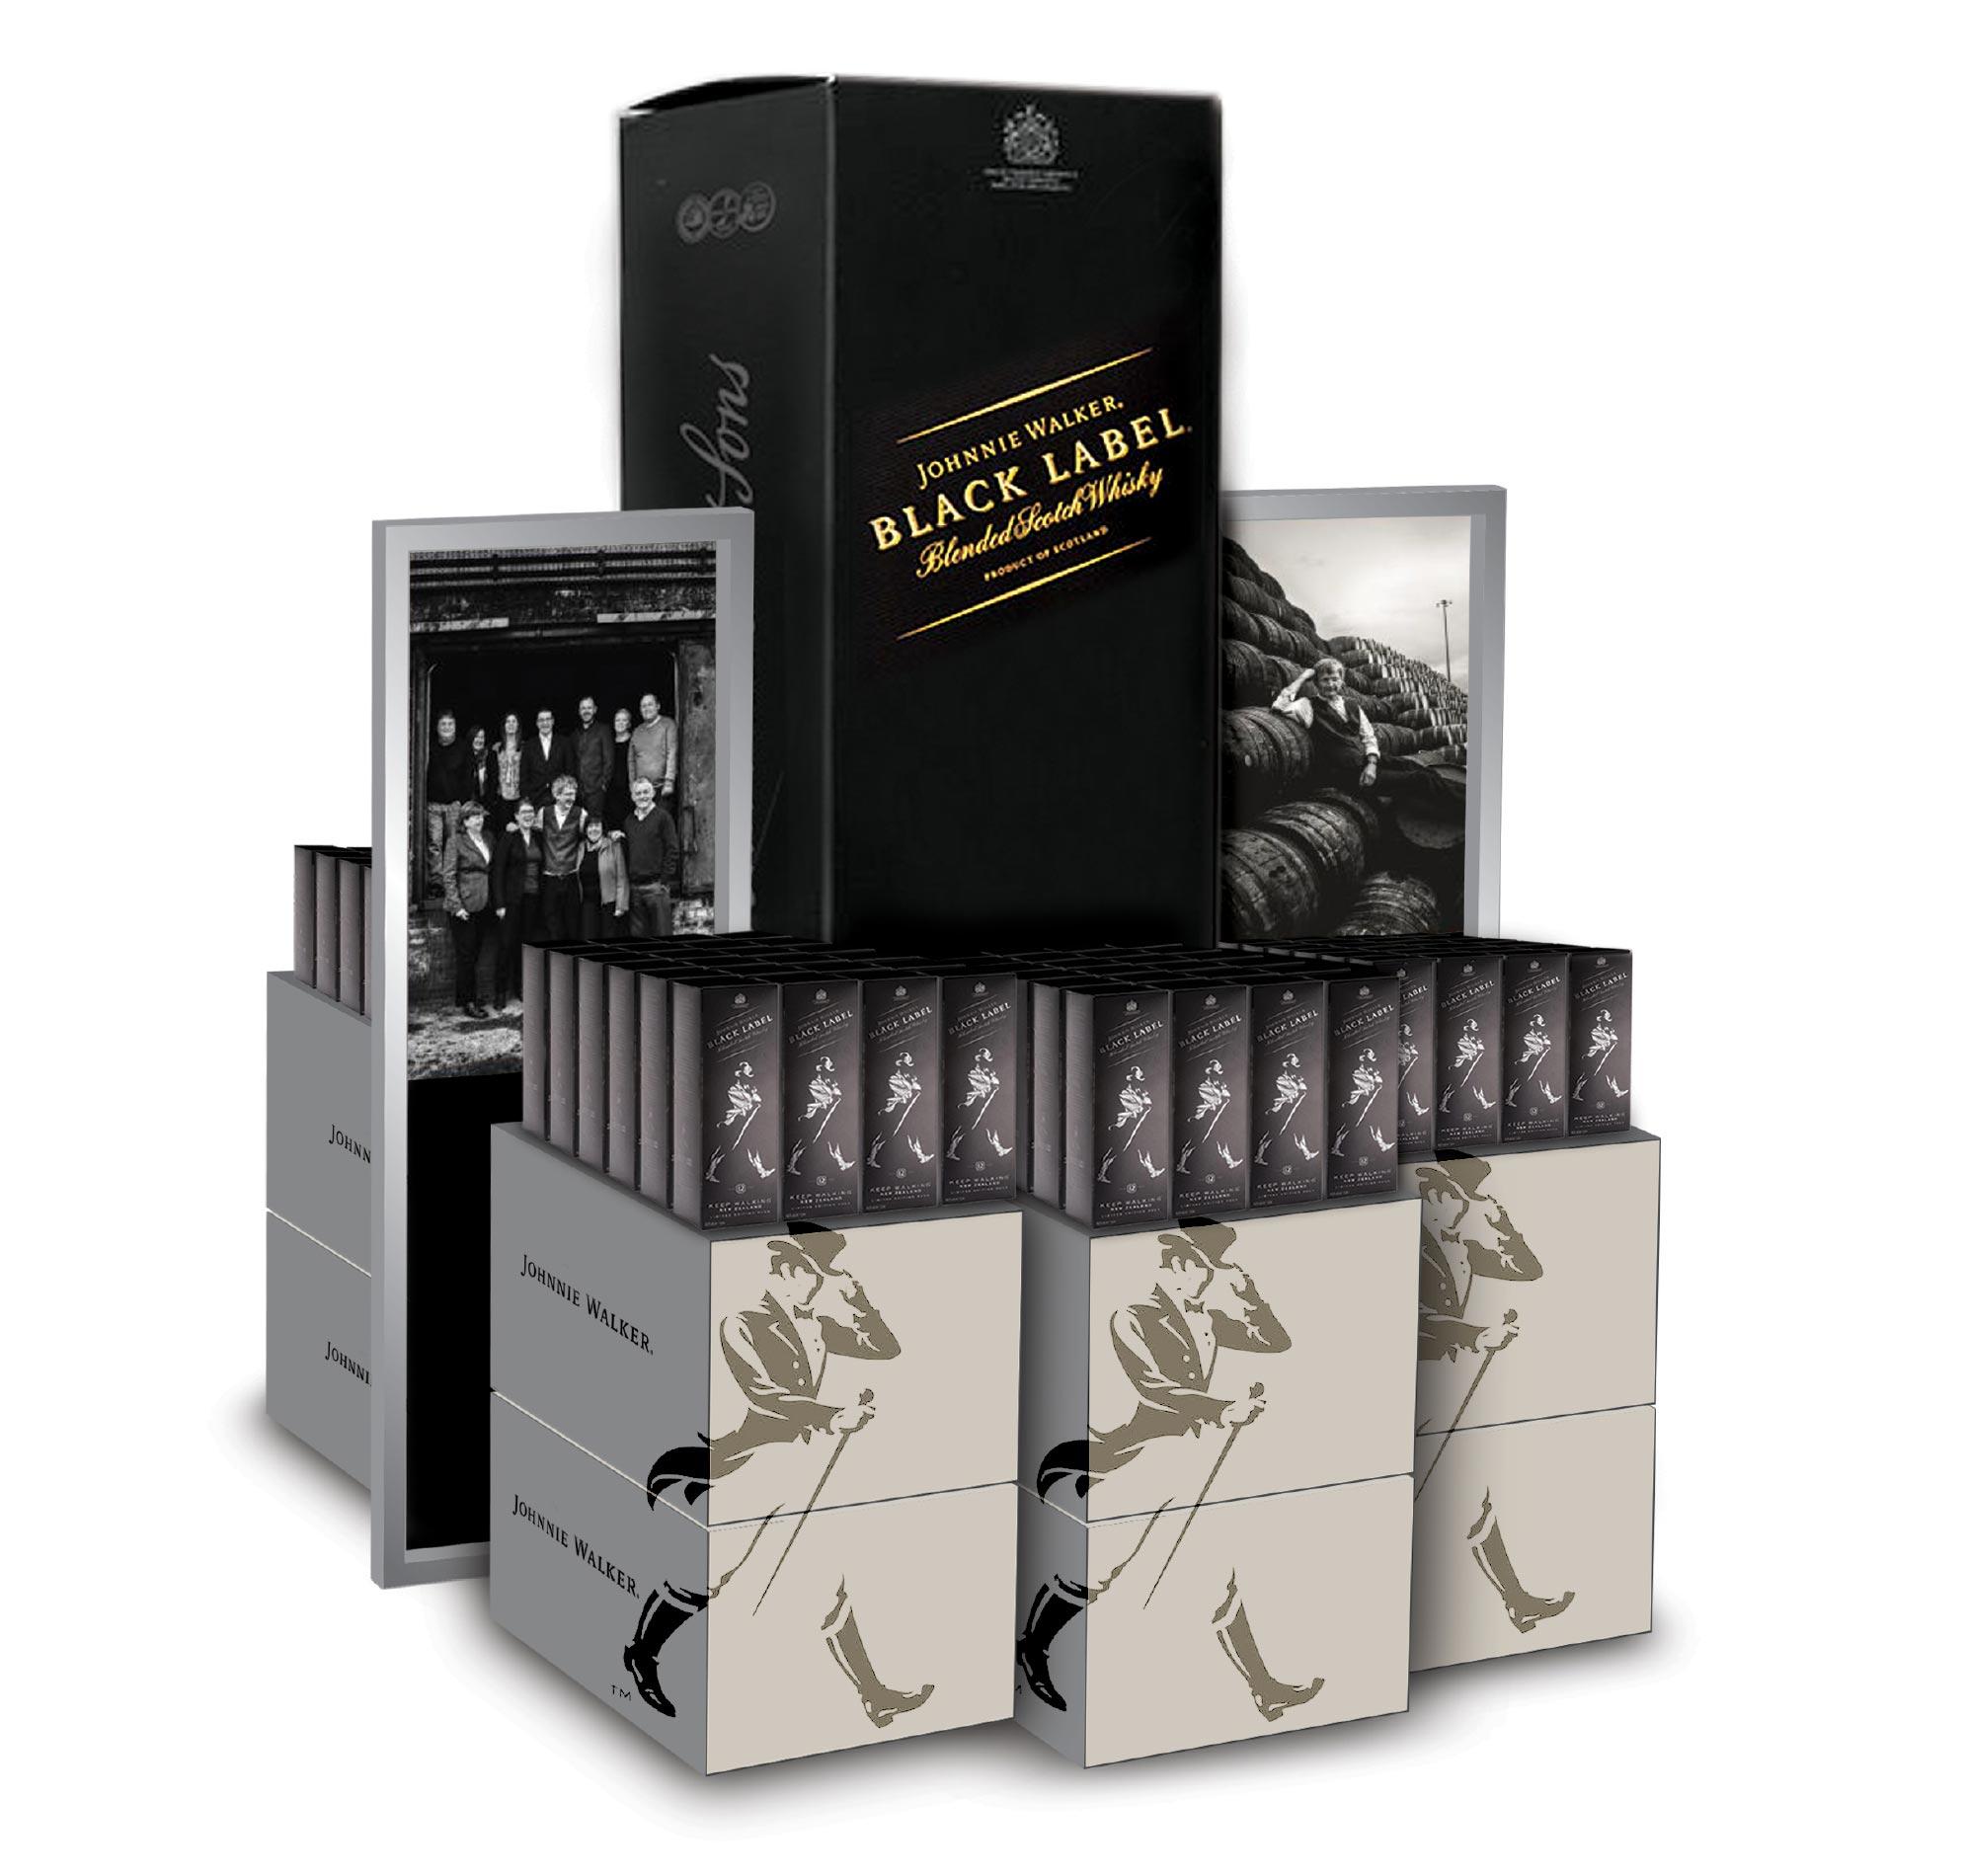 lcbo-johnnie-walker-brand-domination-store-pop-sputnik-design-partners-toronto.jpg